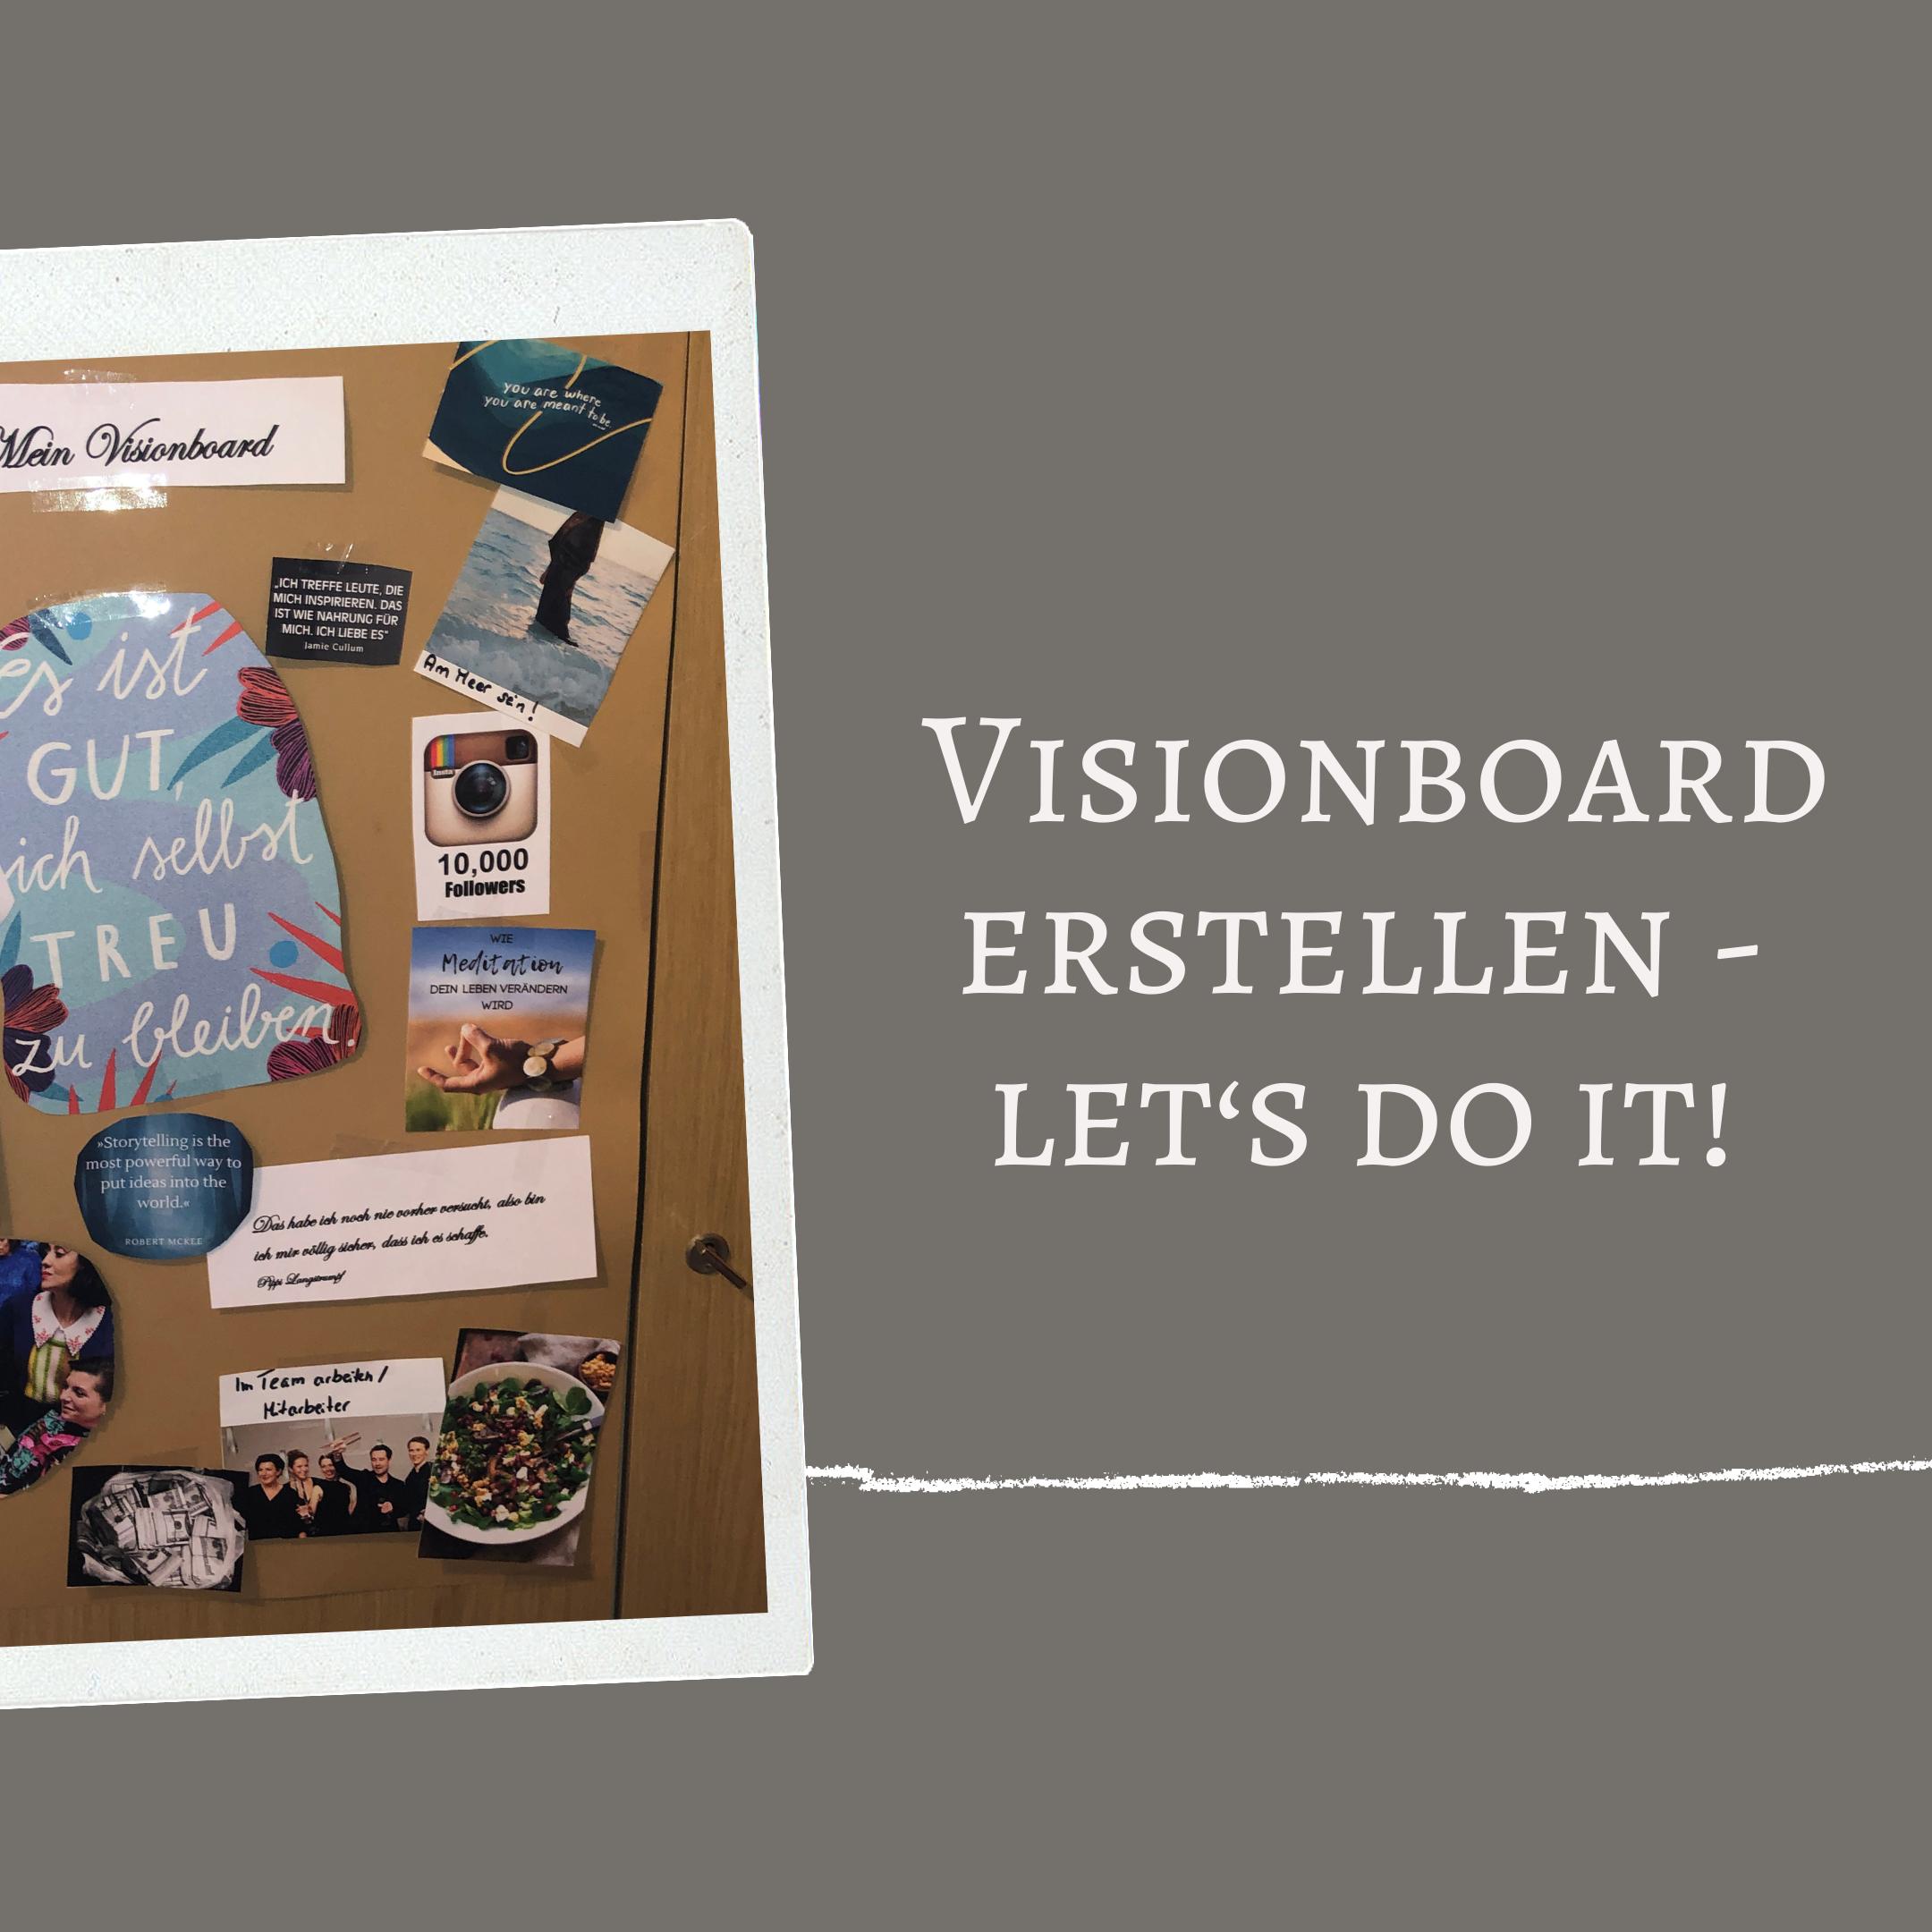 Visionboard; Visionboard selbst erstellen